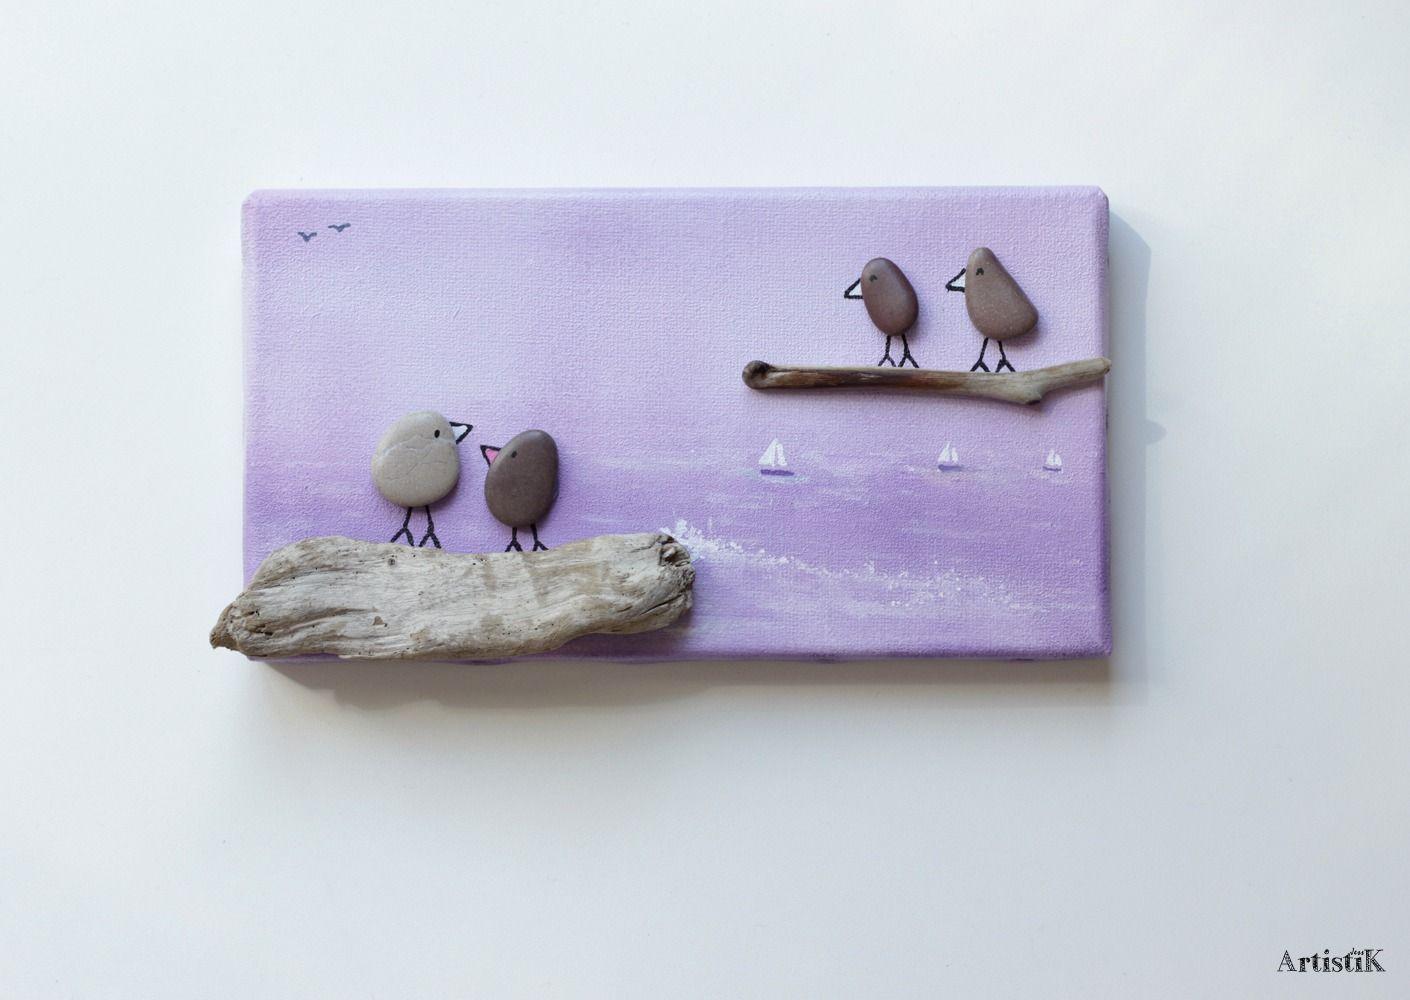 tableau galets oiseaux bois flott fond violet lilas chambre enfant dessin humoristique. Black Bedroom Furniture Sets. Home Design Ideas